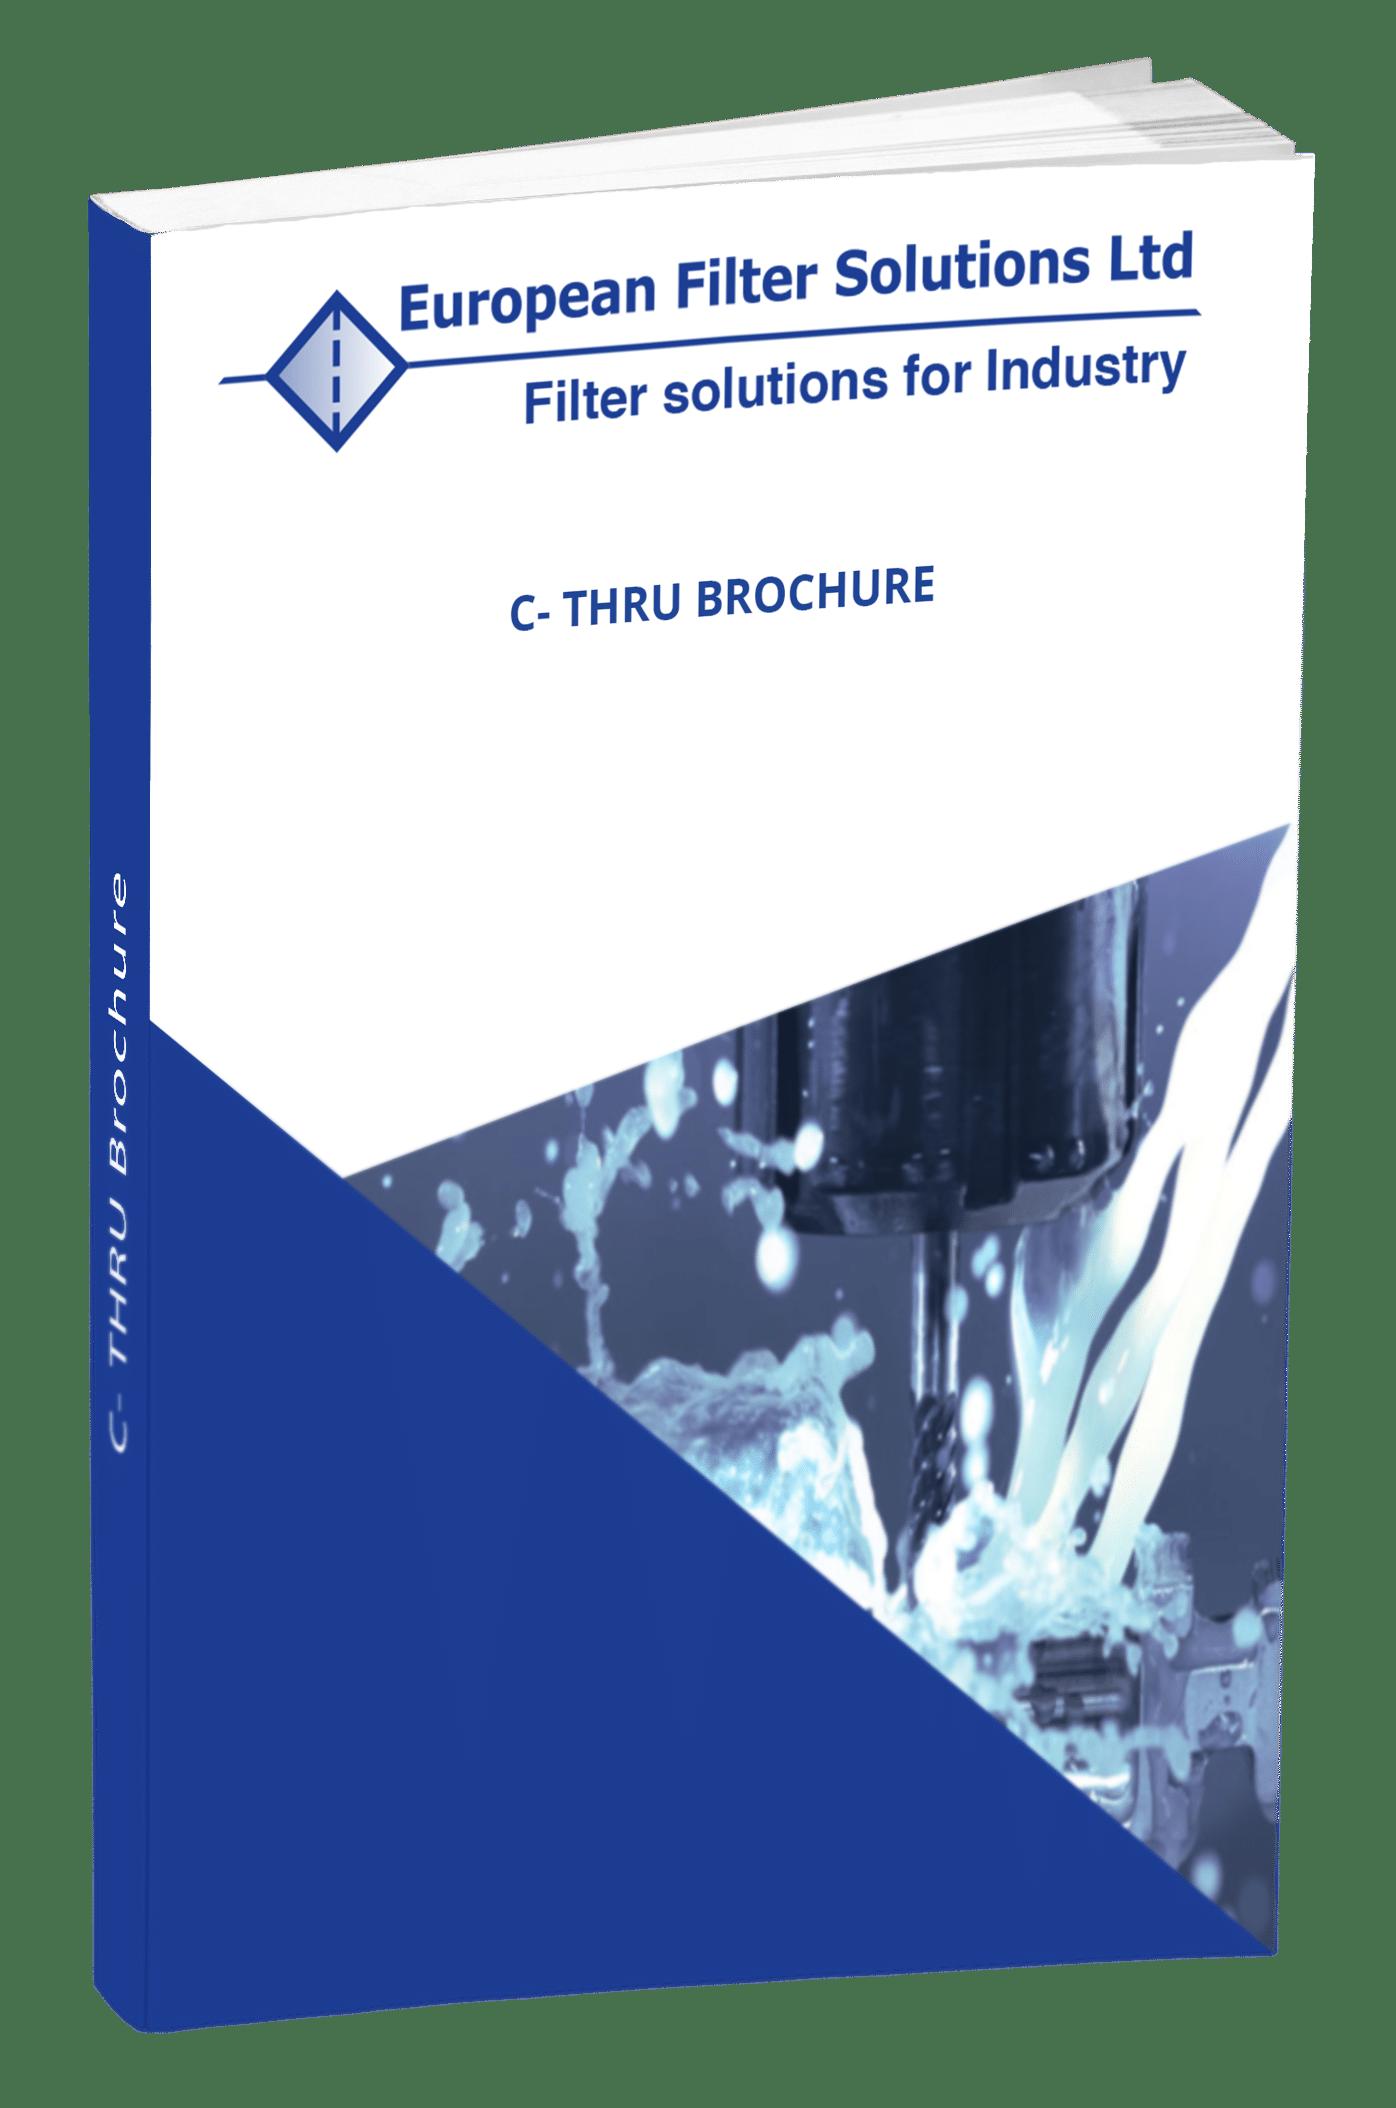 c thru separator brochure cover